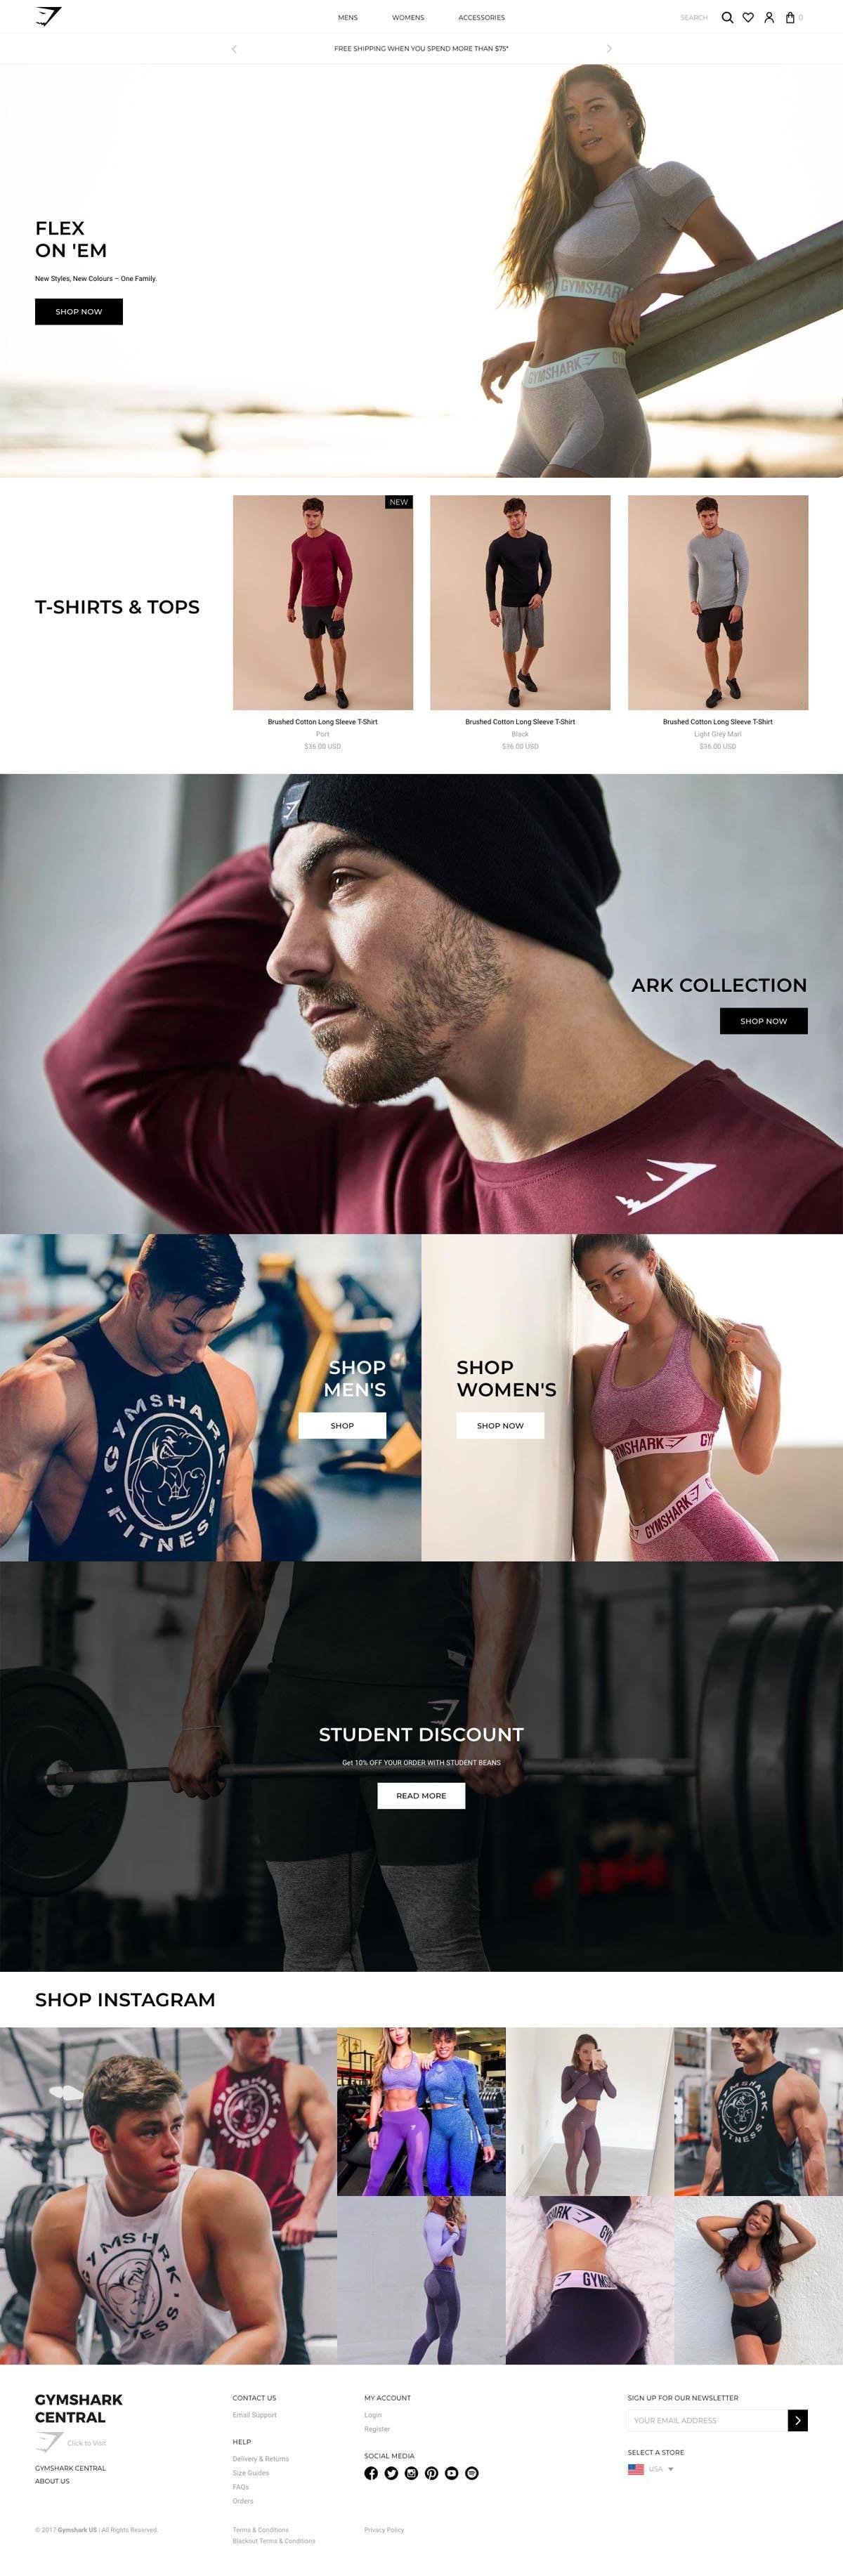 eCommerce website: Gymshark